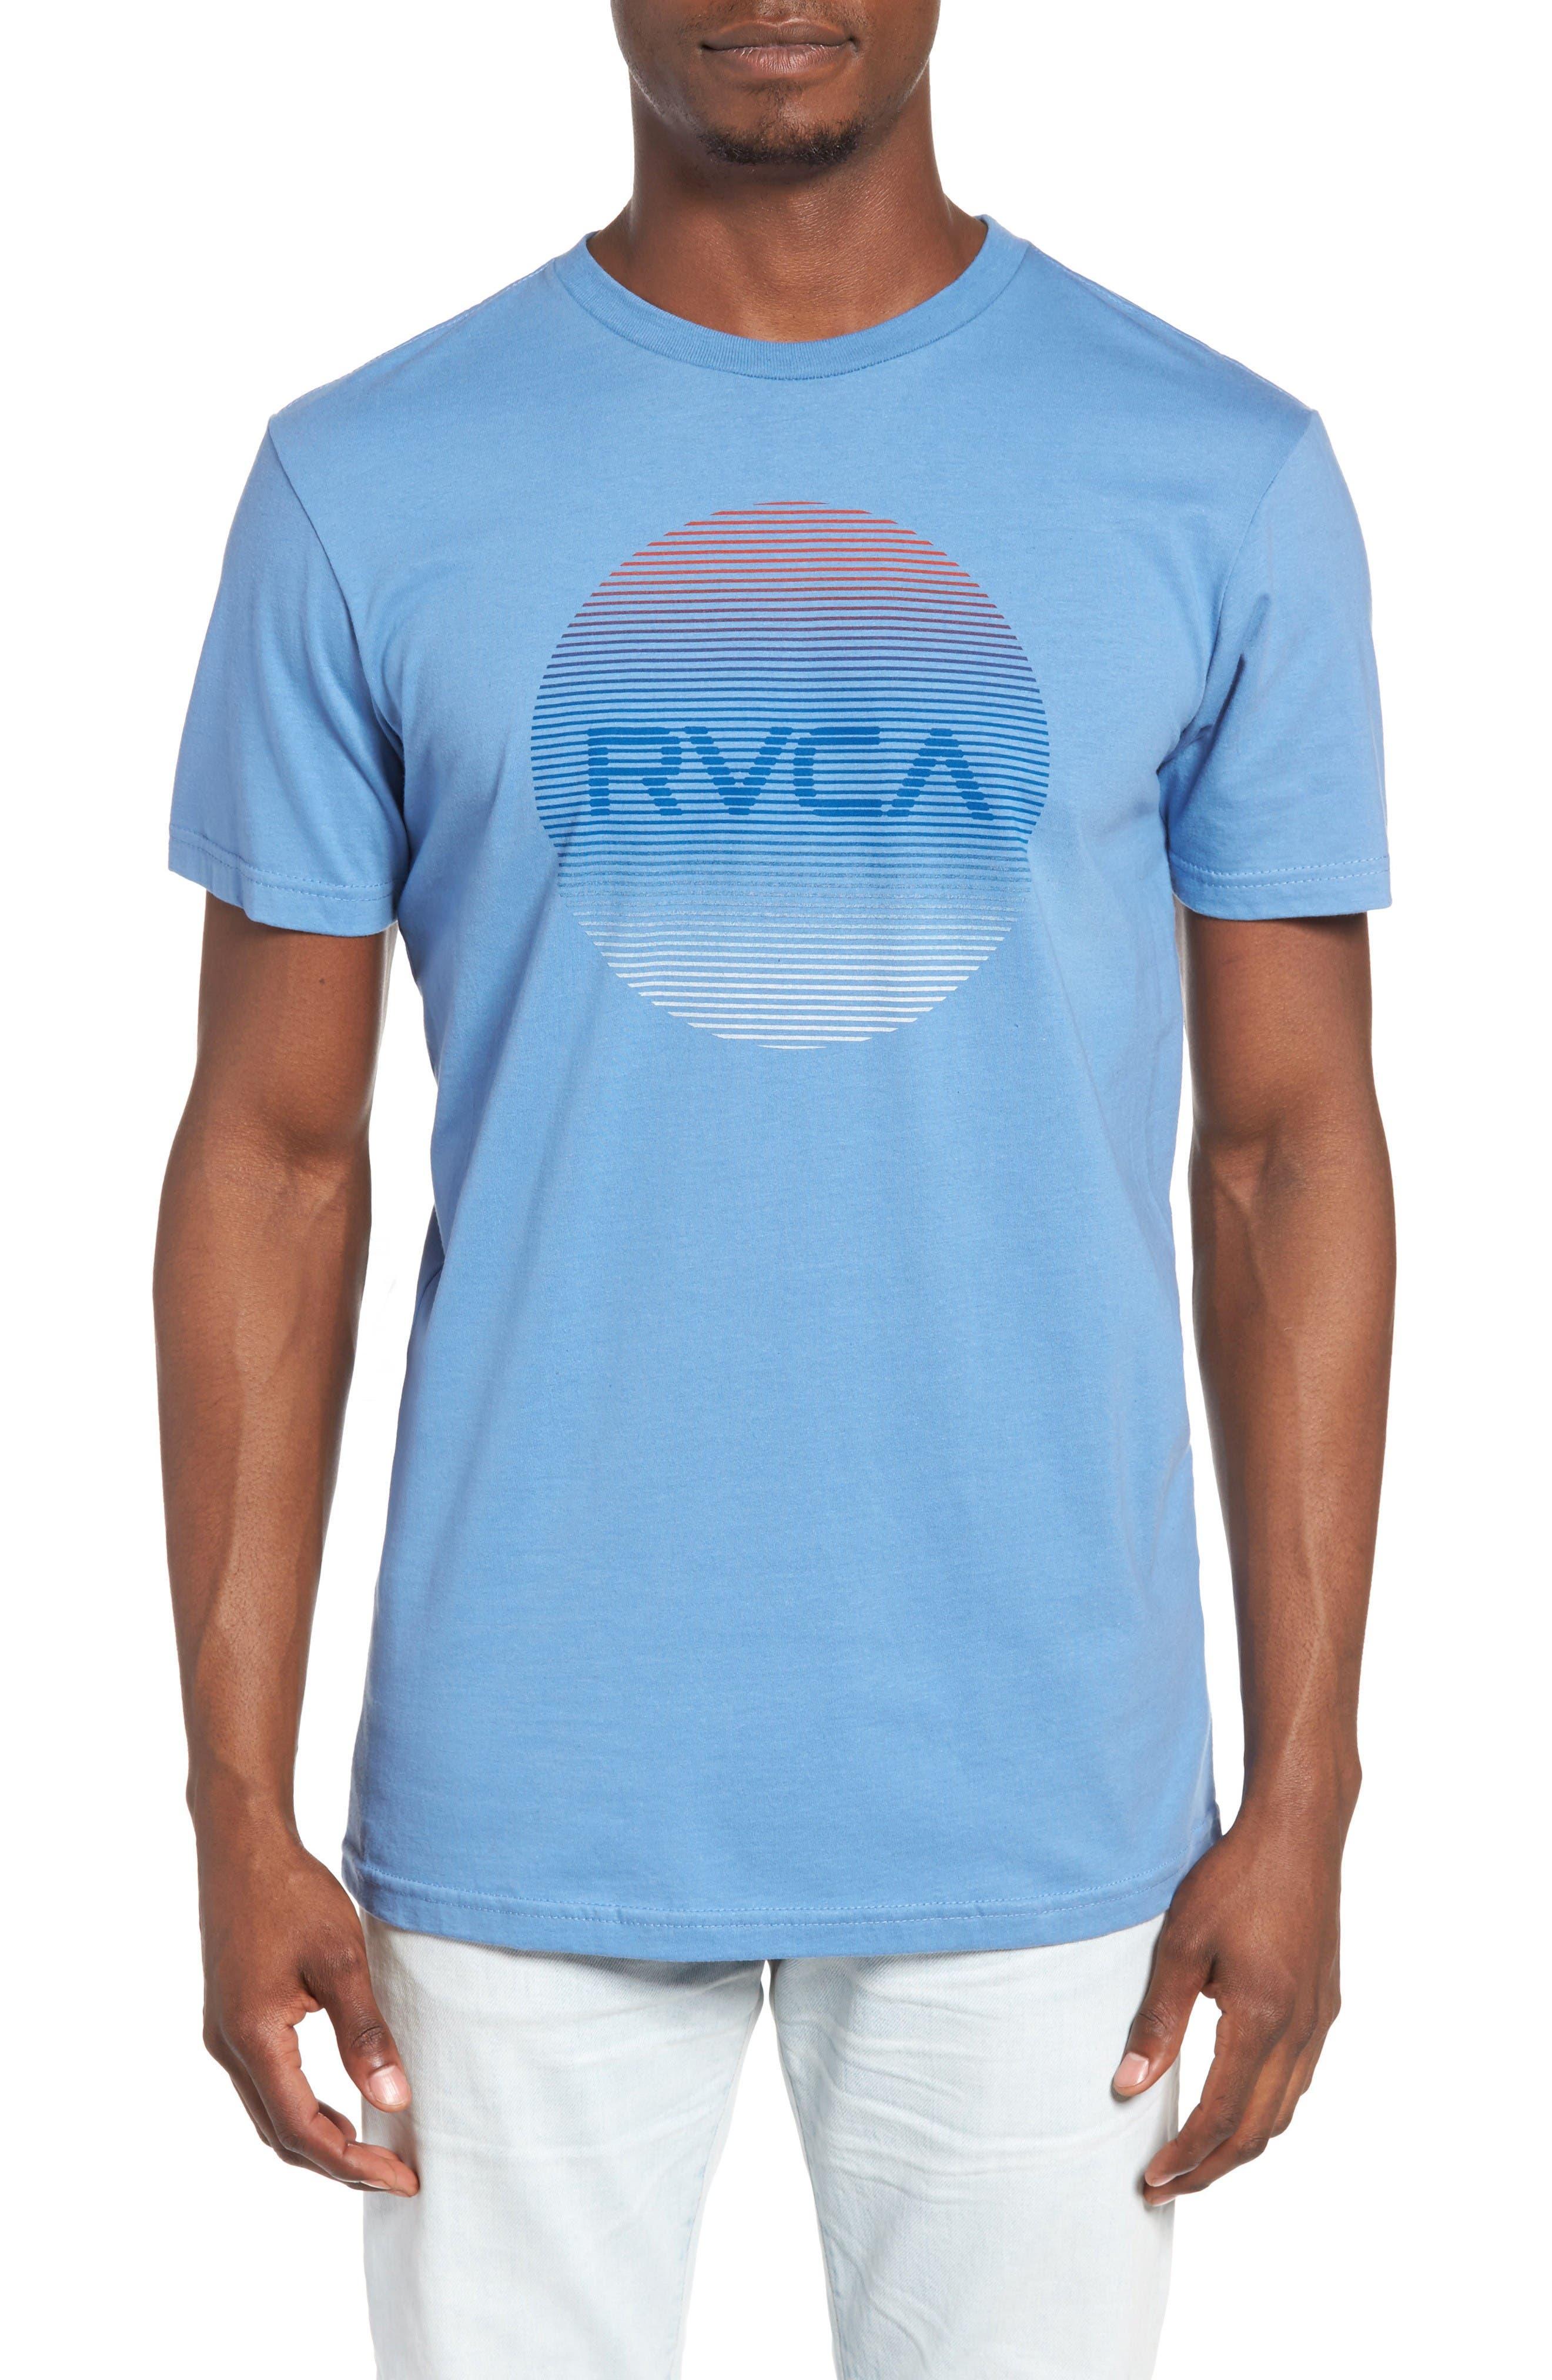 RVCA Motors Lined Graphic T-Shirt